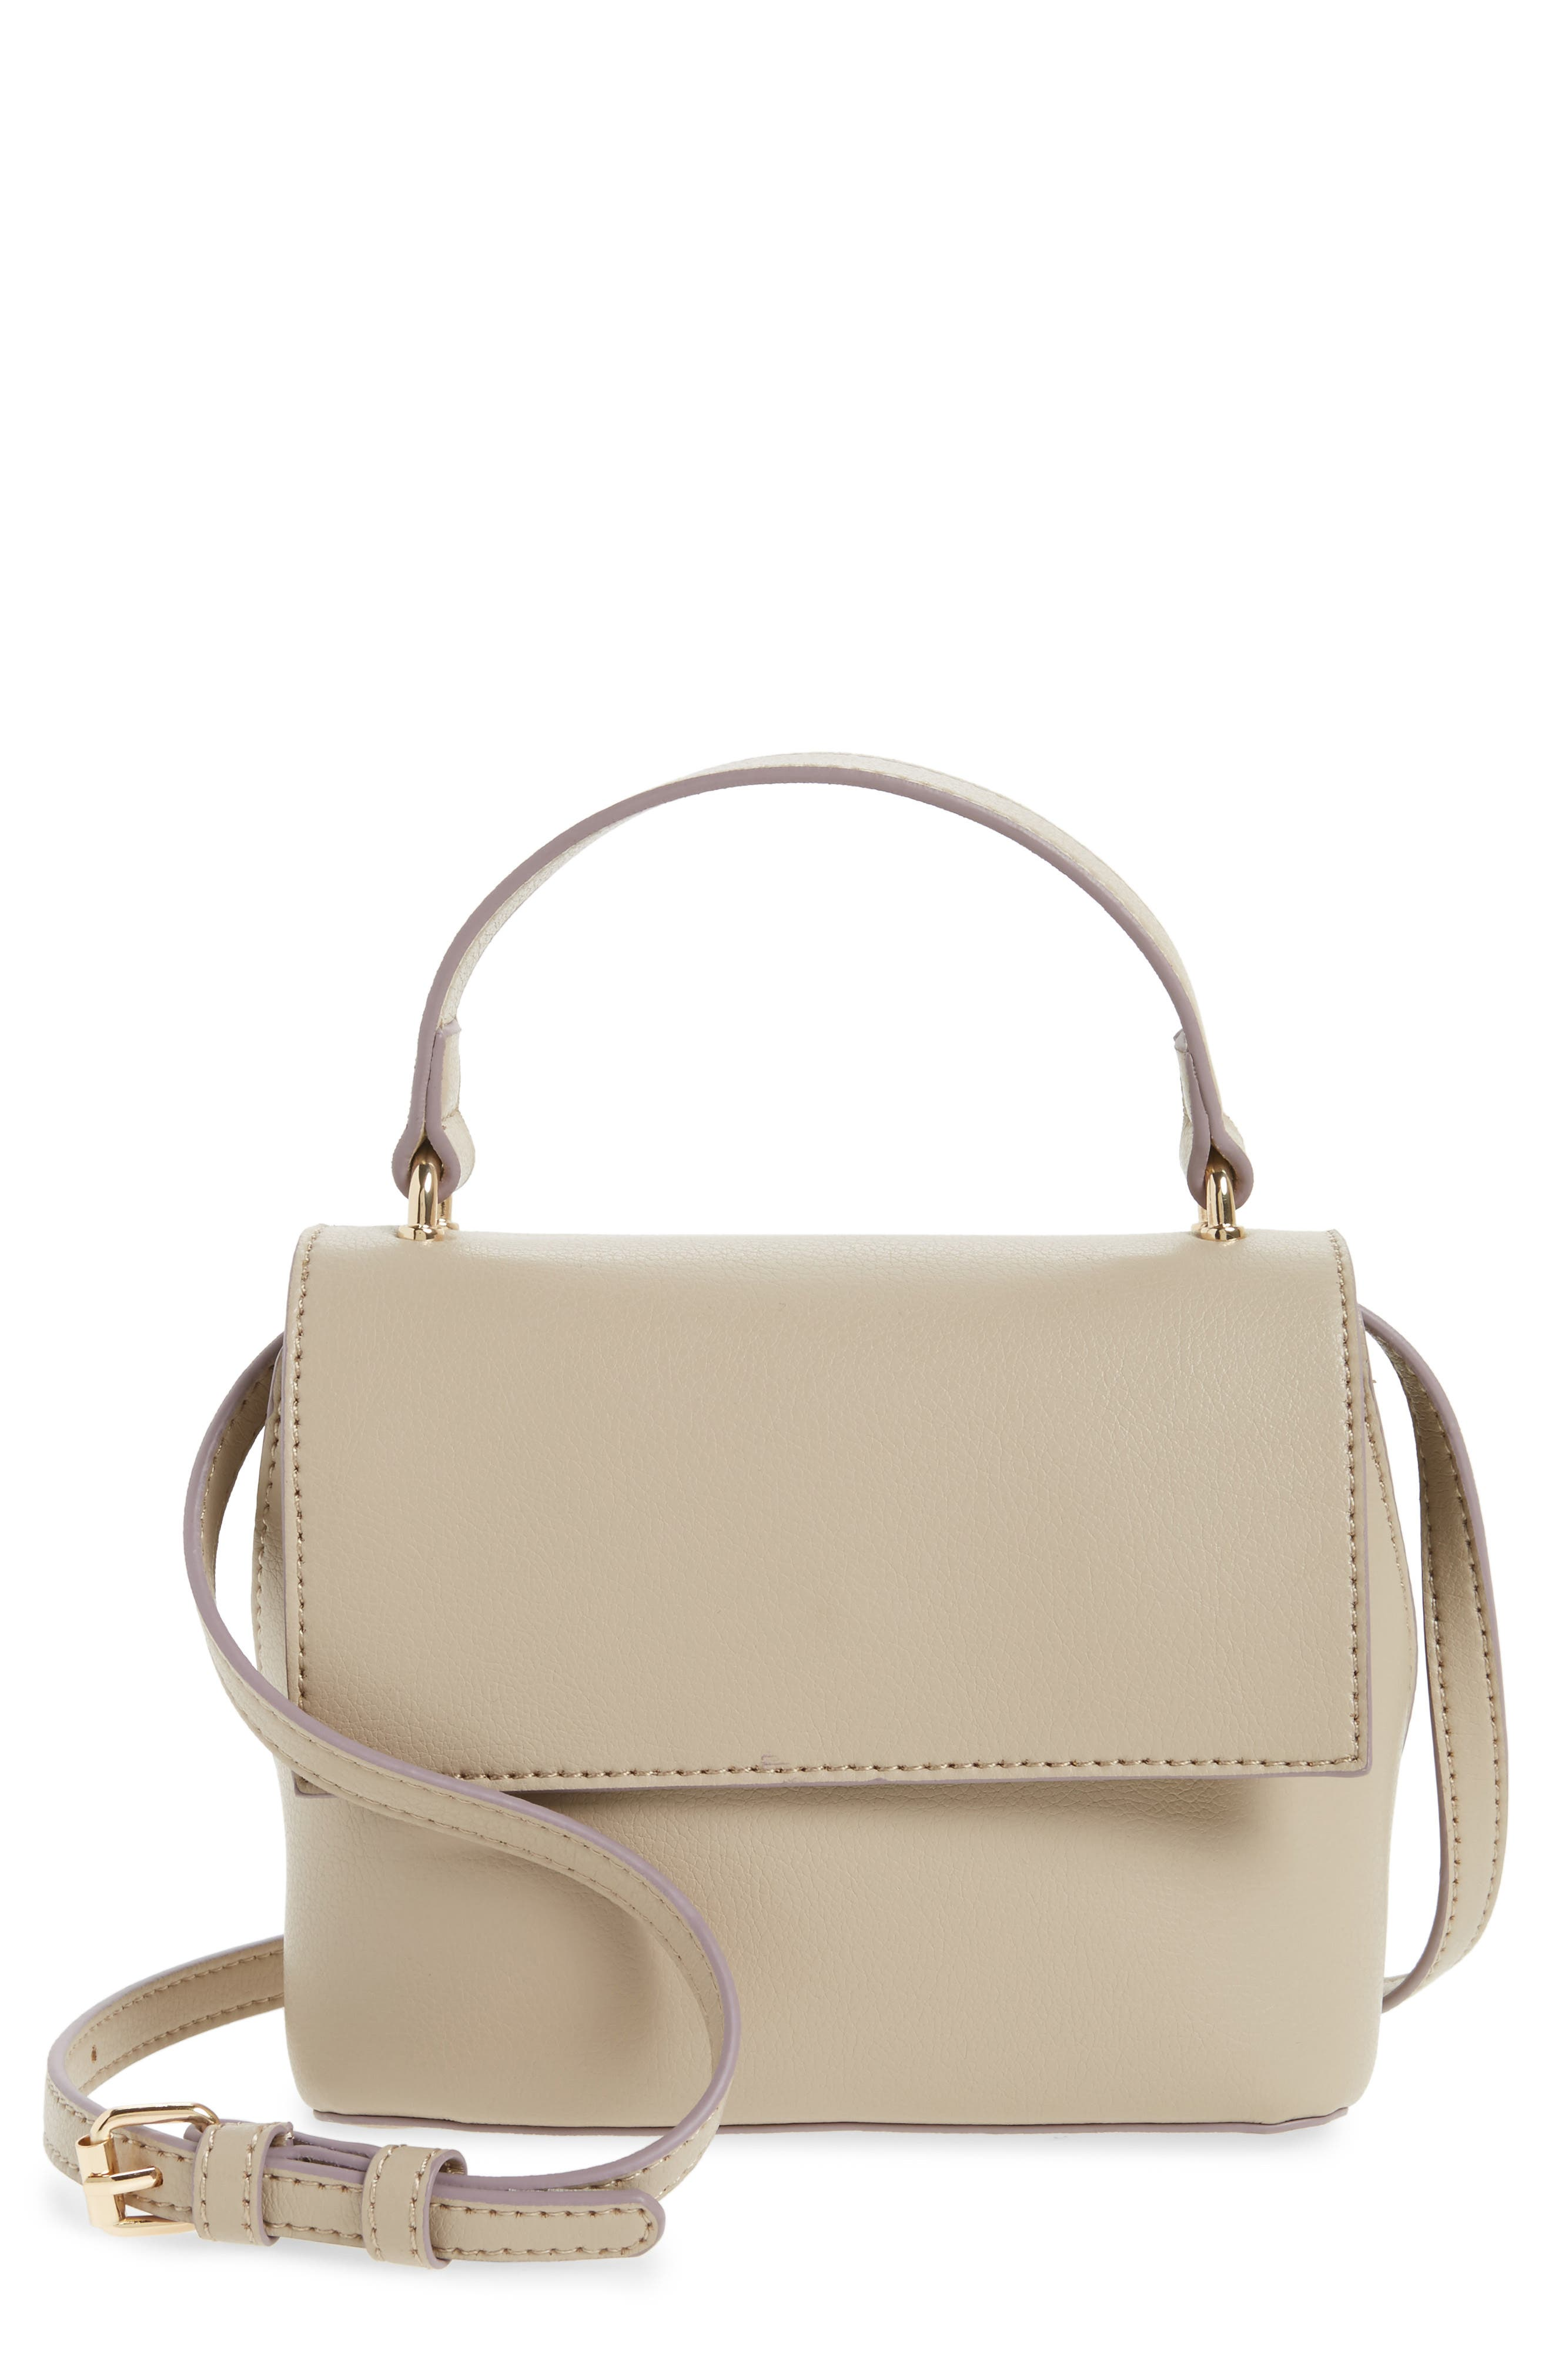 Alternate Image 1 Selected - Sole Society Mini Chino Crossbody Bag